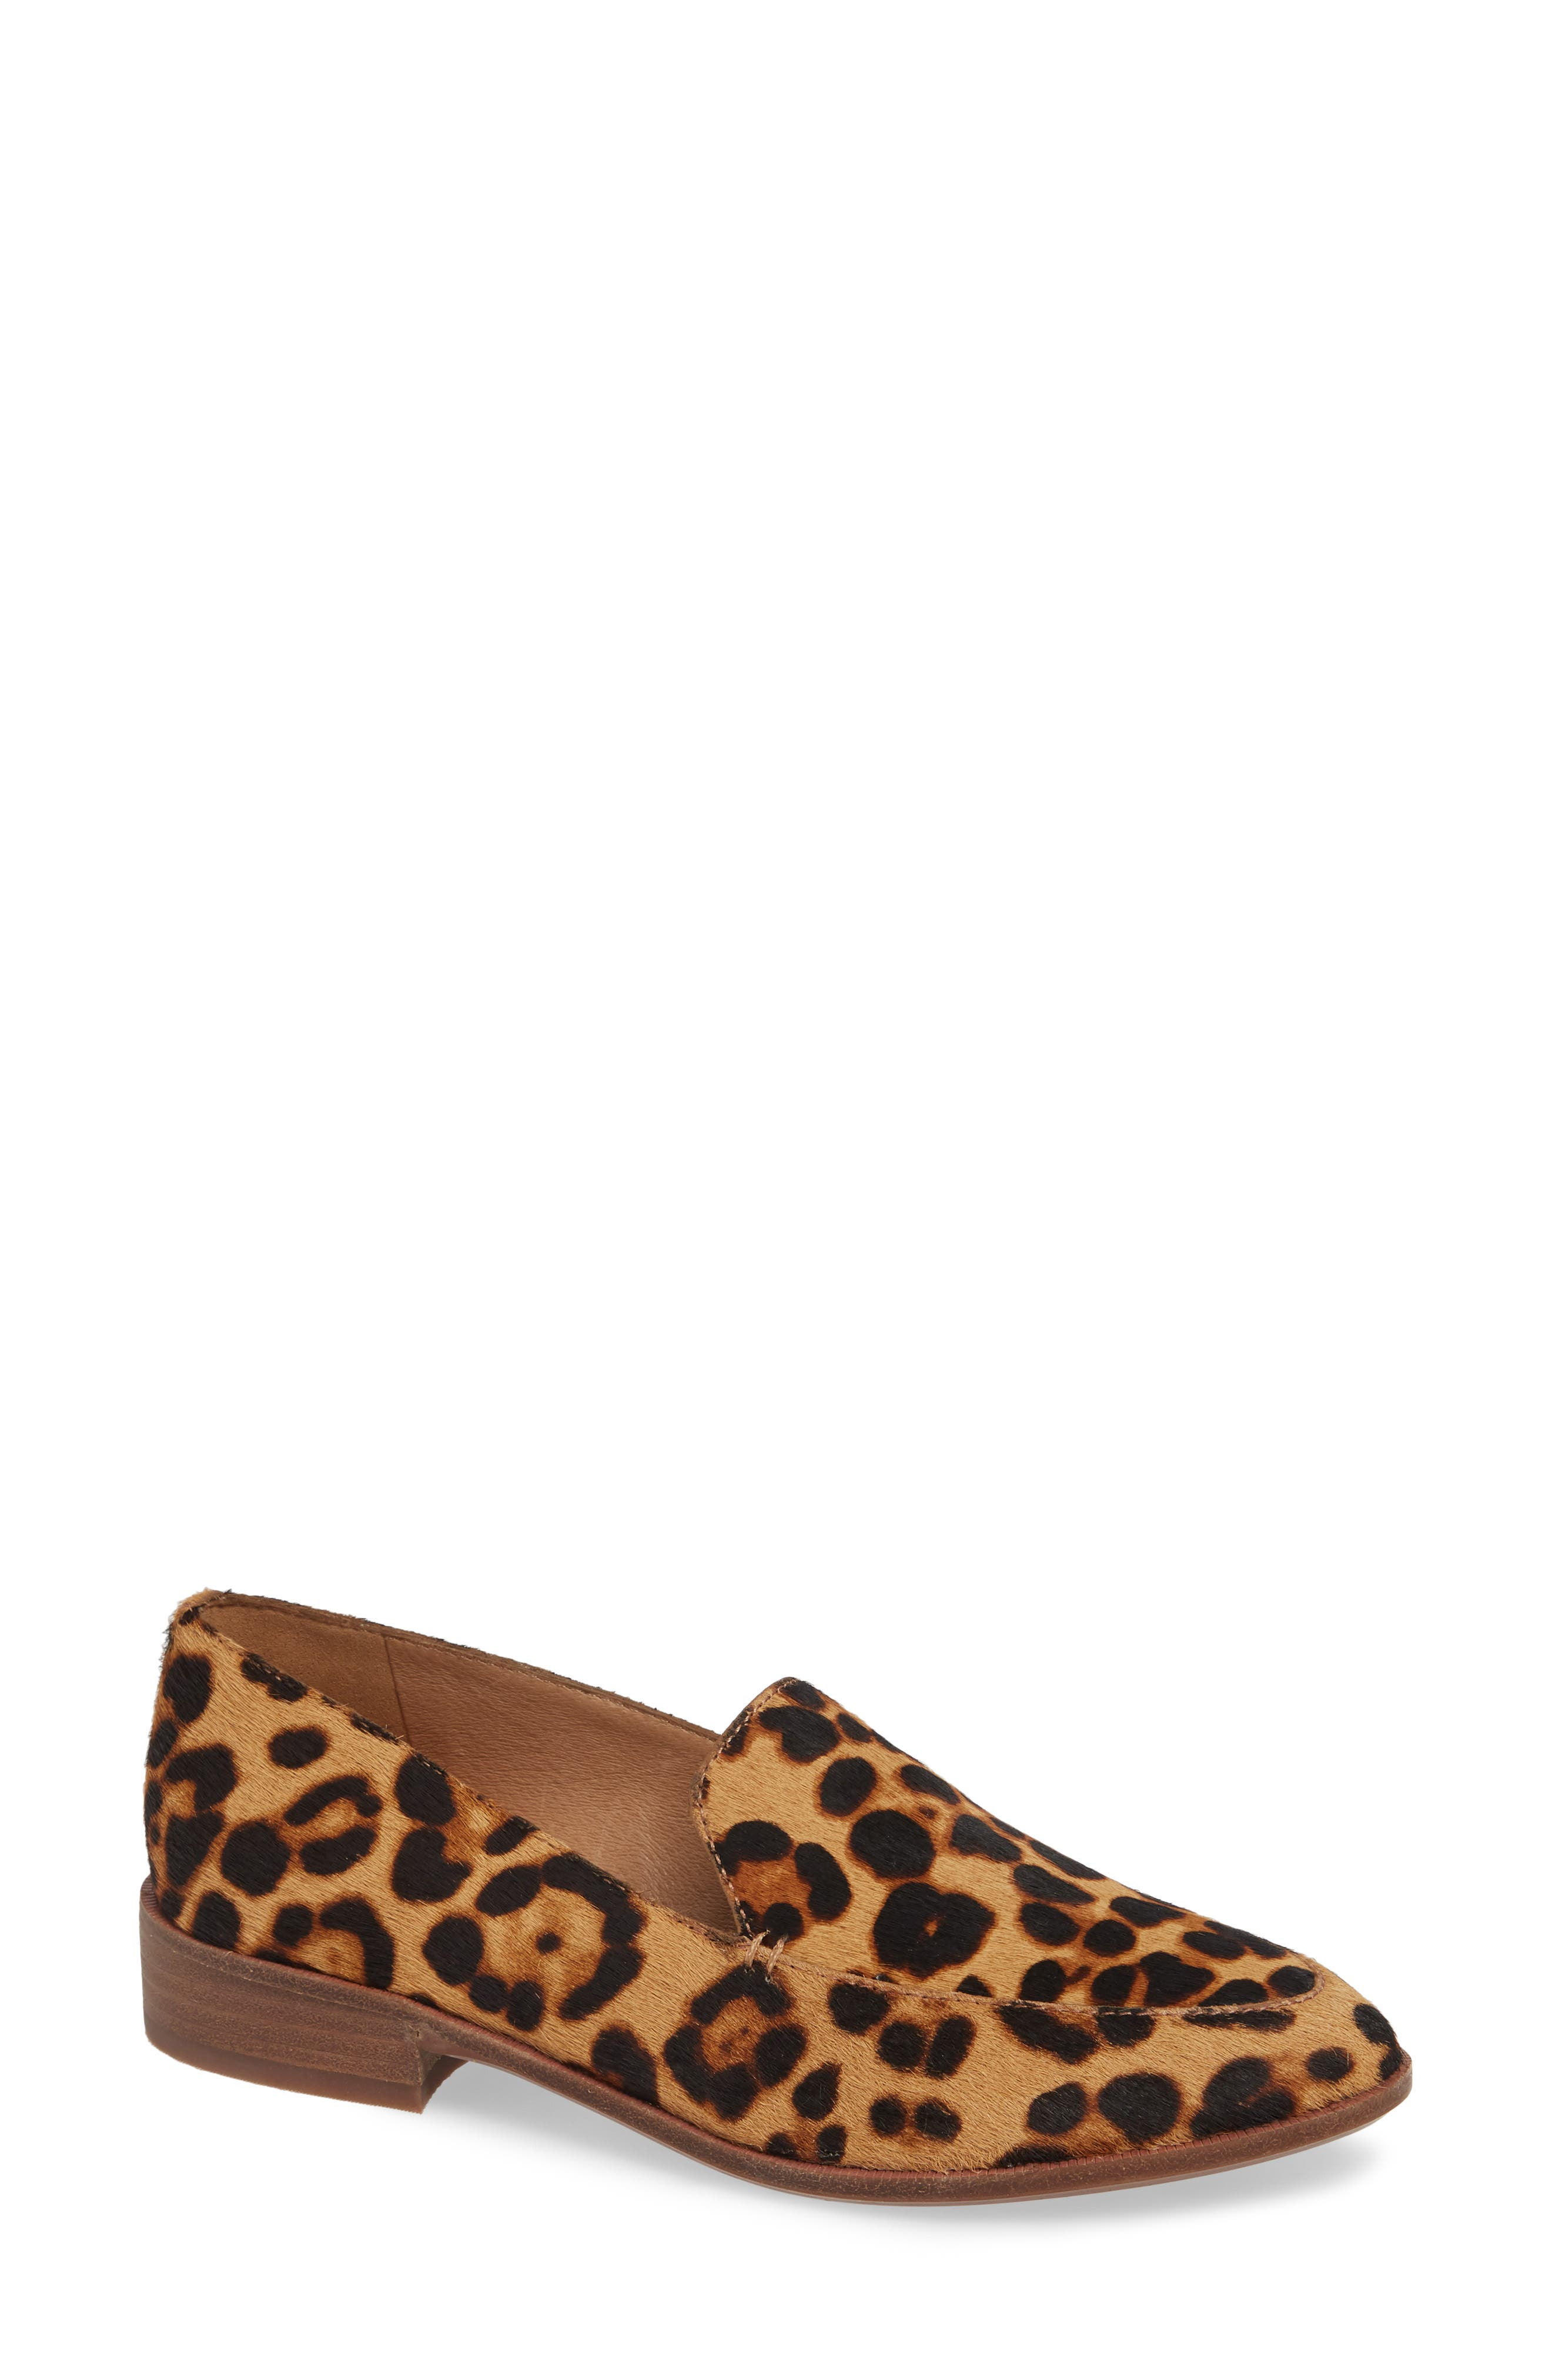 The Frances Genuine Calf Hair Loafer,                         Main,                         color, TRUFFLE MULTI LEOPARD CALFHAIR